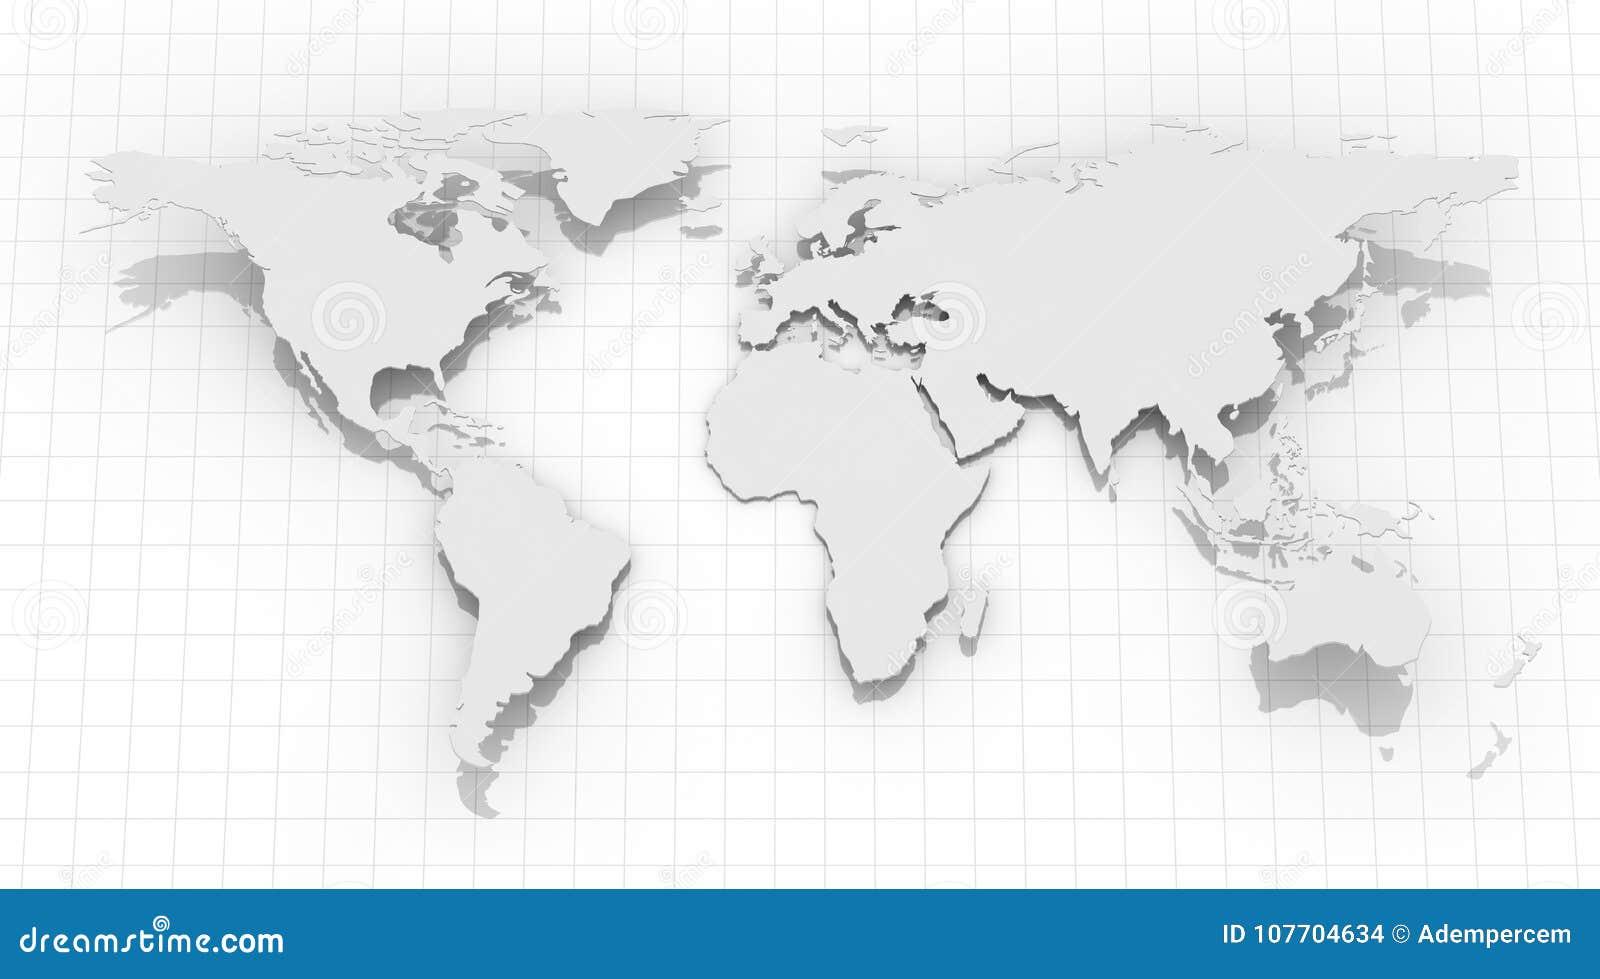 World map on grid background stock illustration illustration of world map on grid background royalty free stock photo gumiabroncs Choice Image